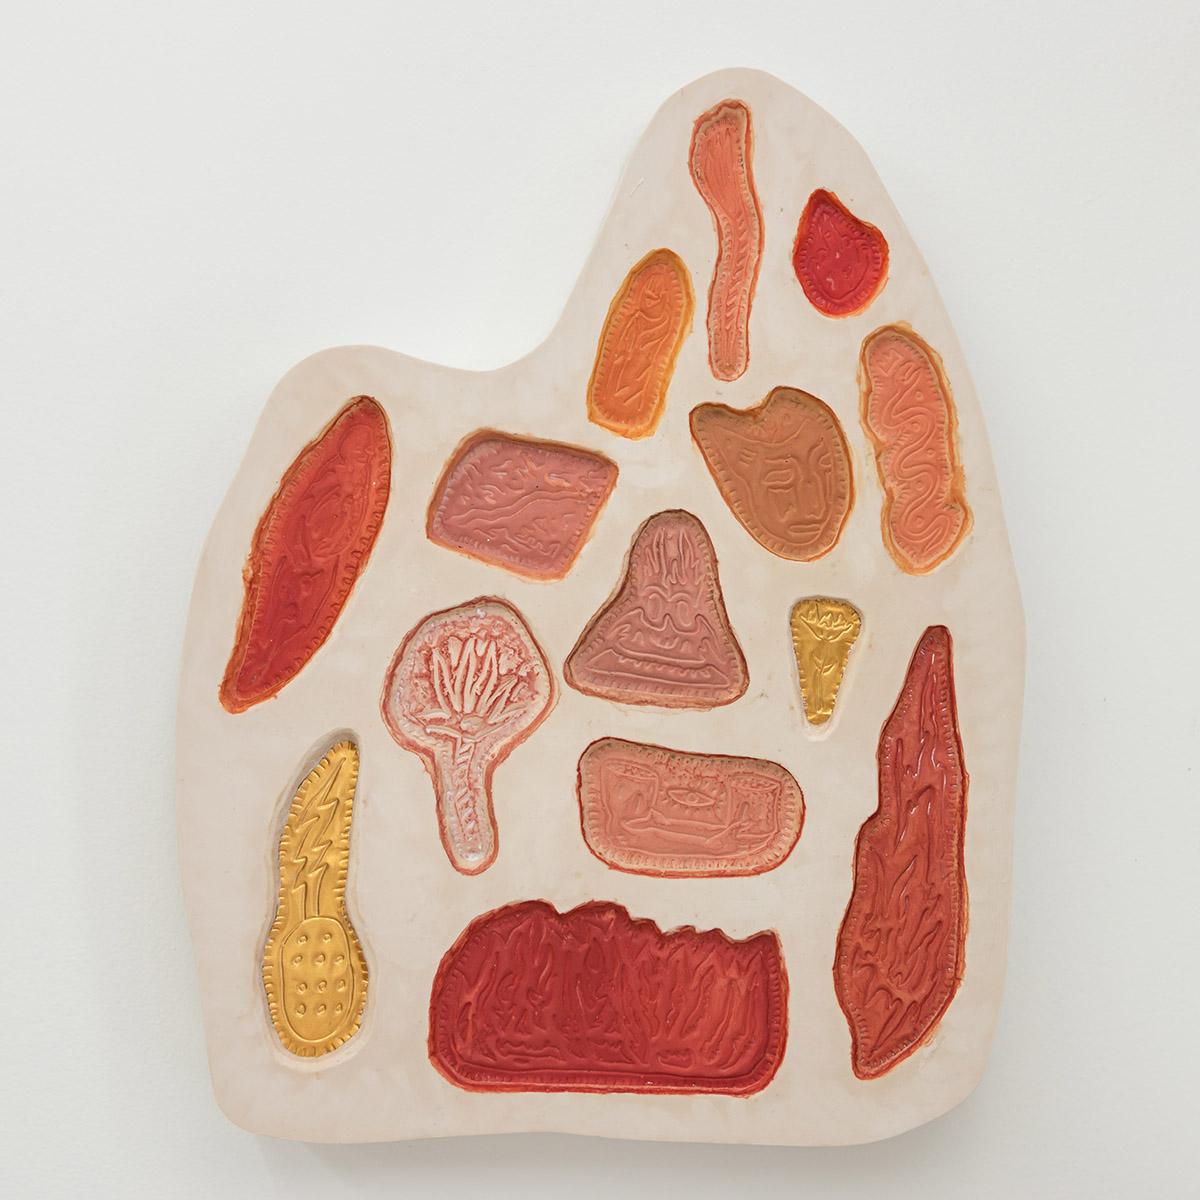 Matias Armendaris, 'Mixing Tablet I', Sculpture, Aqua-Resin, embossed brass, fiberglass, pigment, 17 x 24 x 2,5 in, 2017